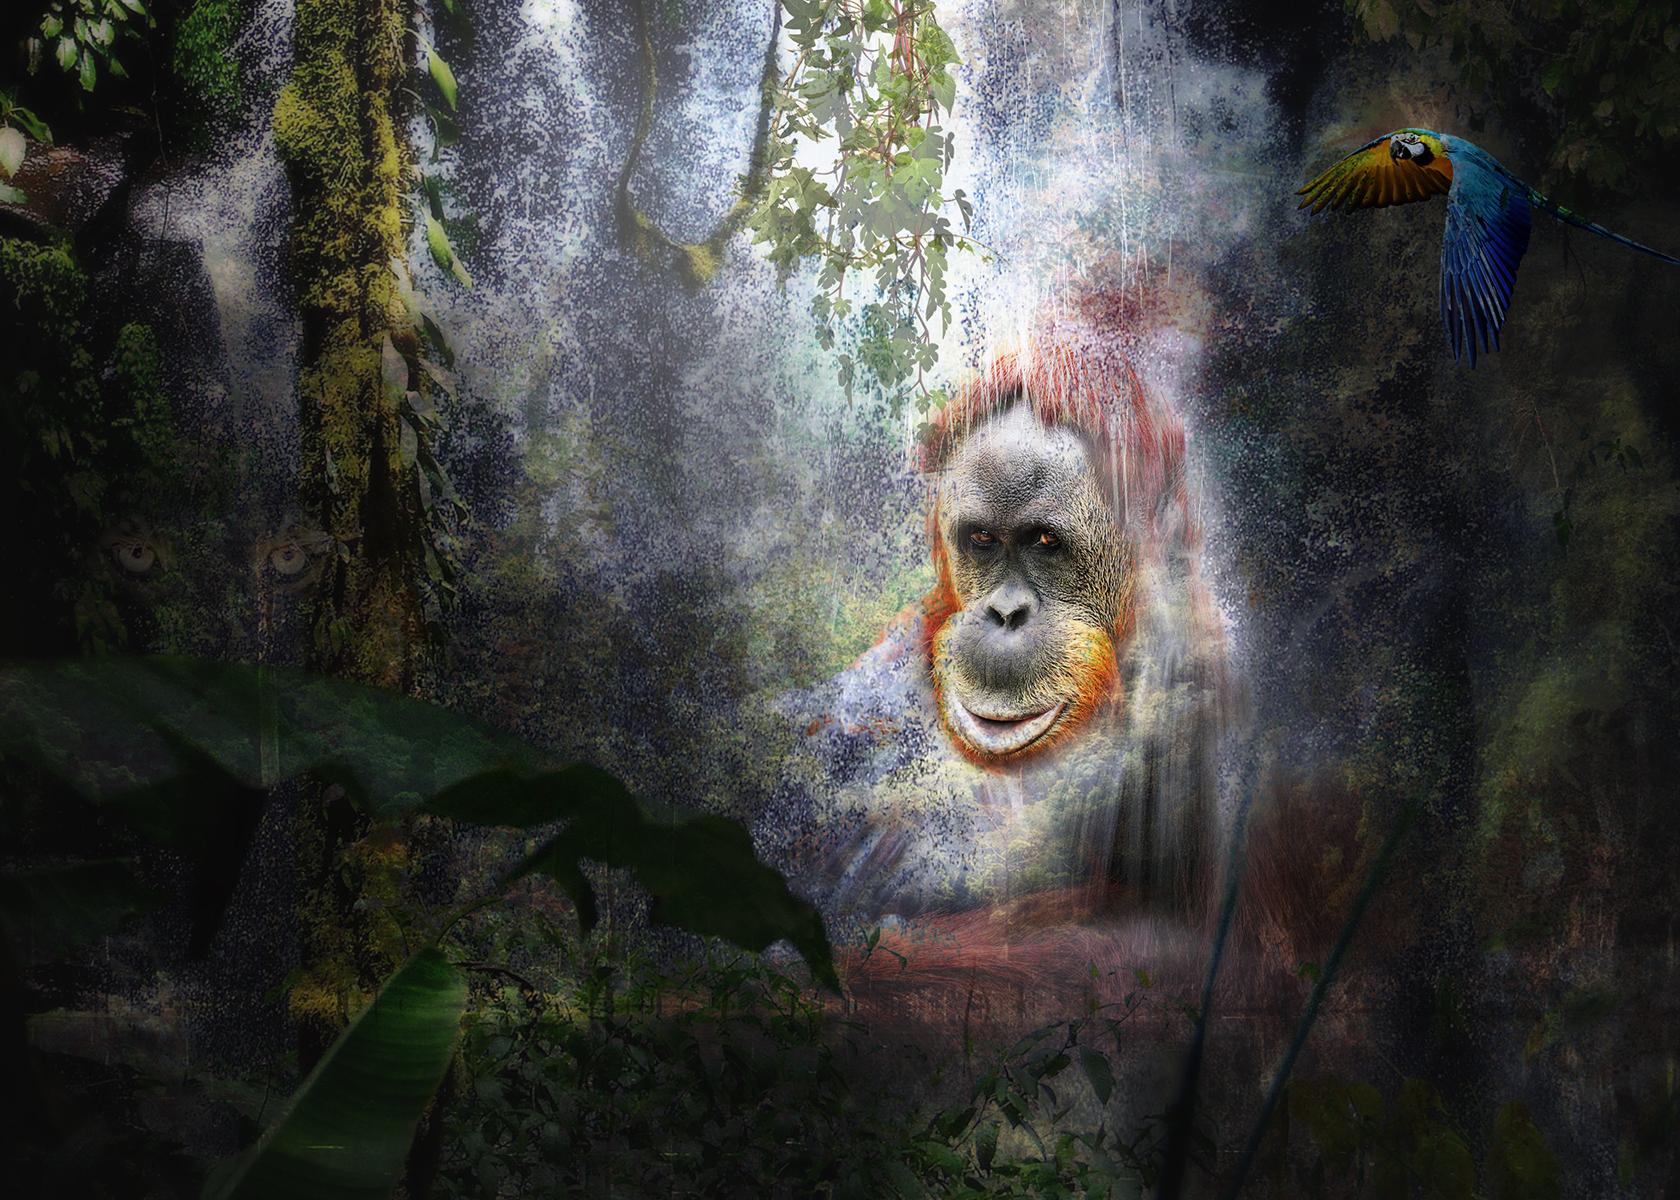 I Am the Rainforest